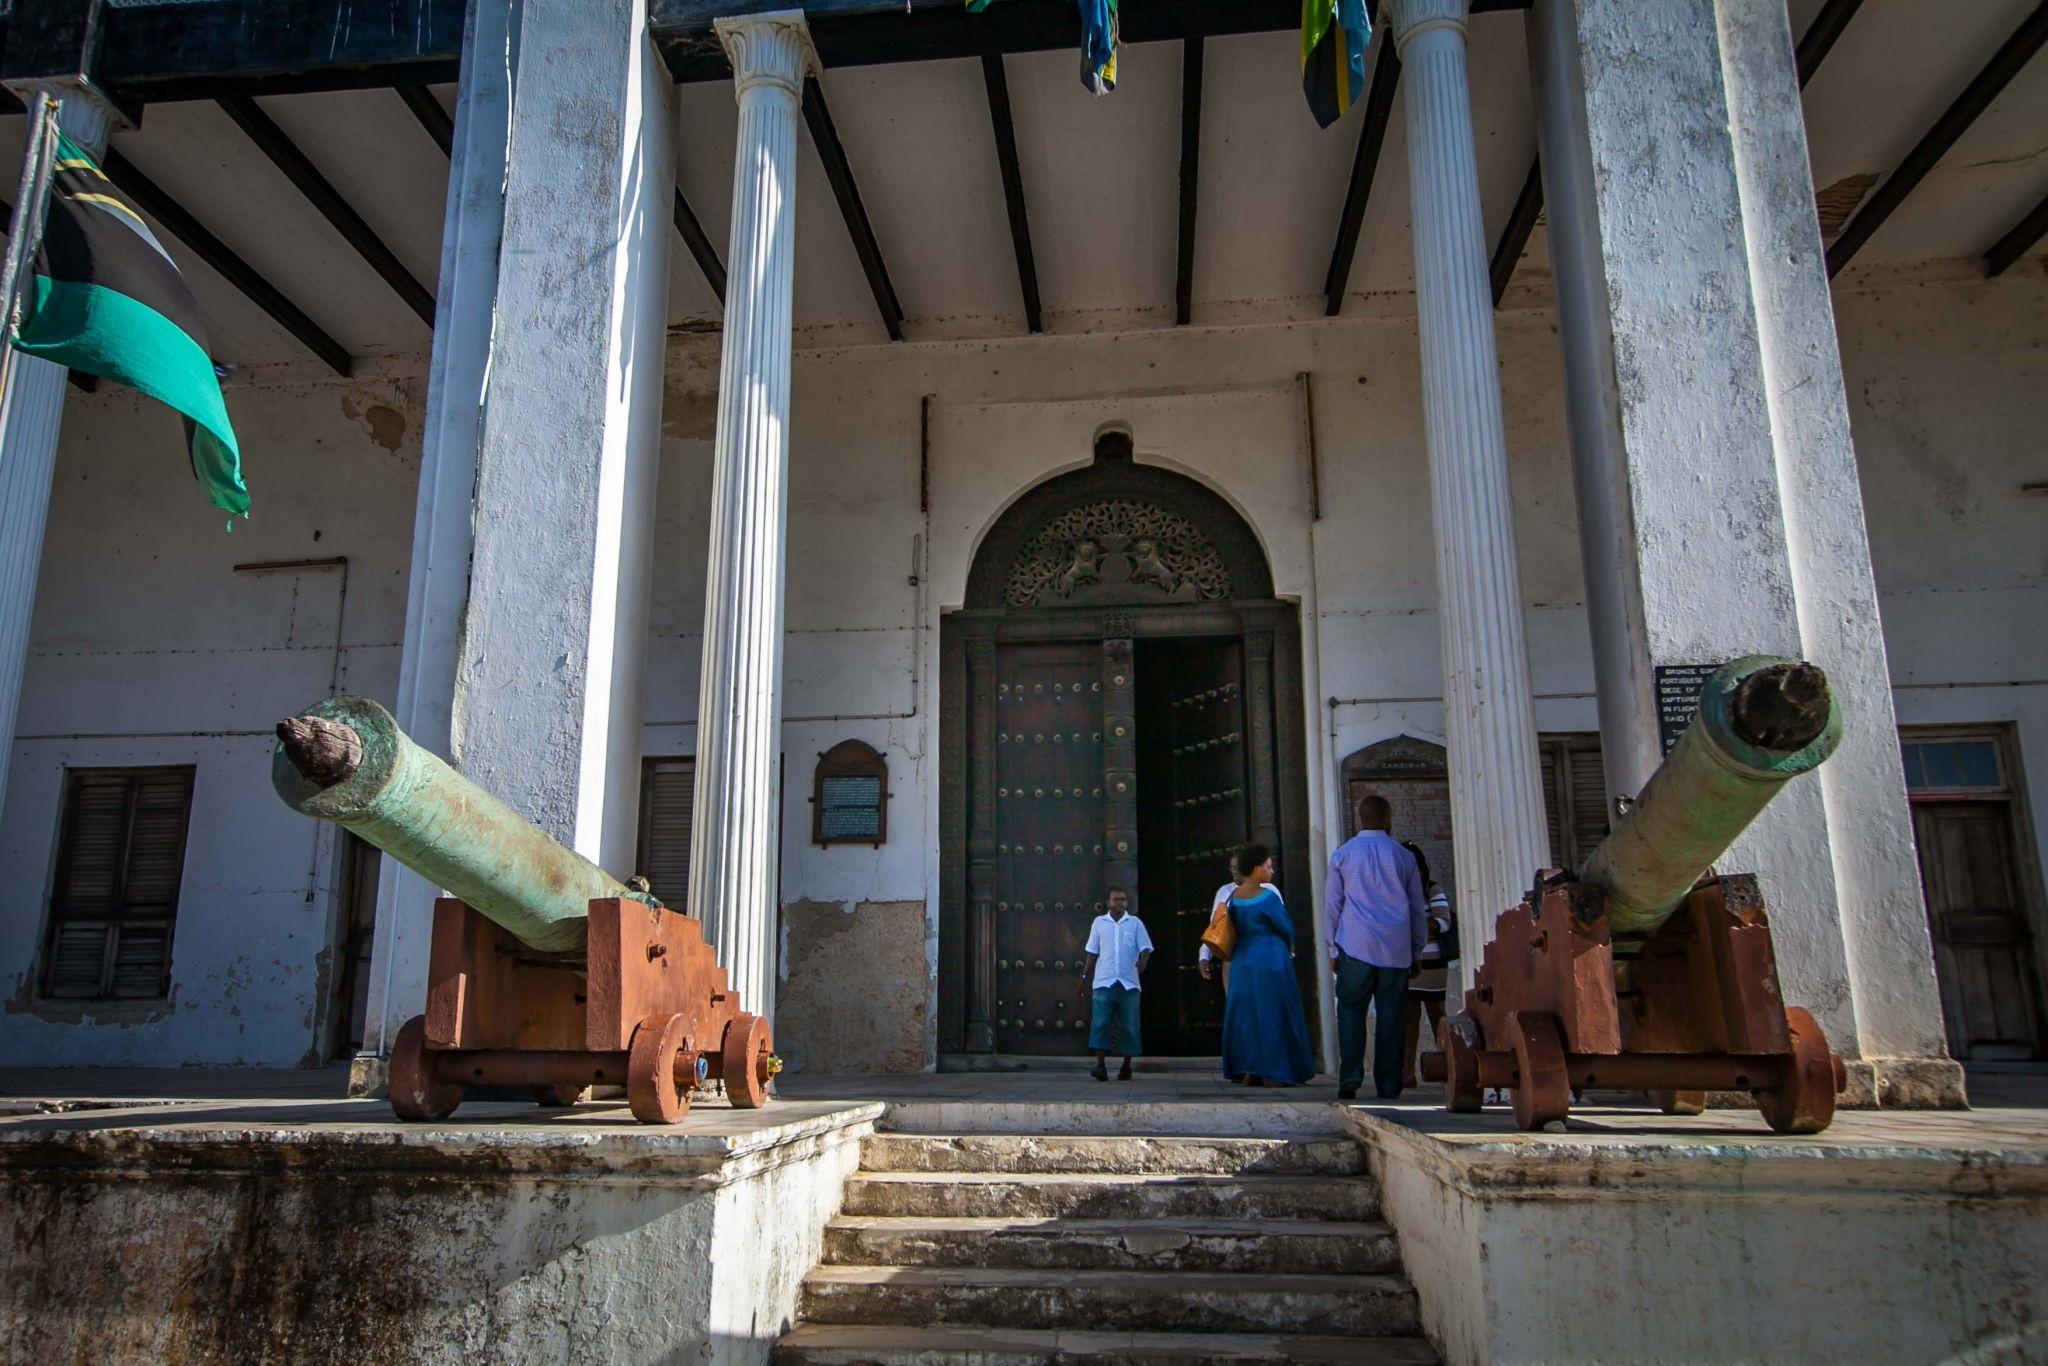 The House or Palace of Wonders  Stone Town Zanzibar, Tanzania